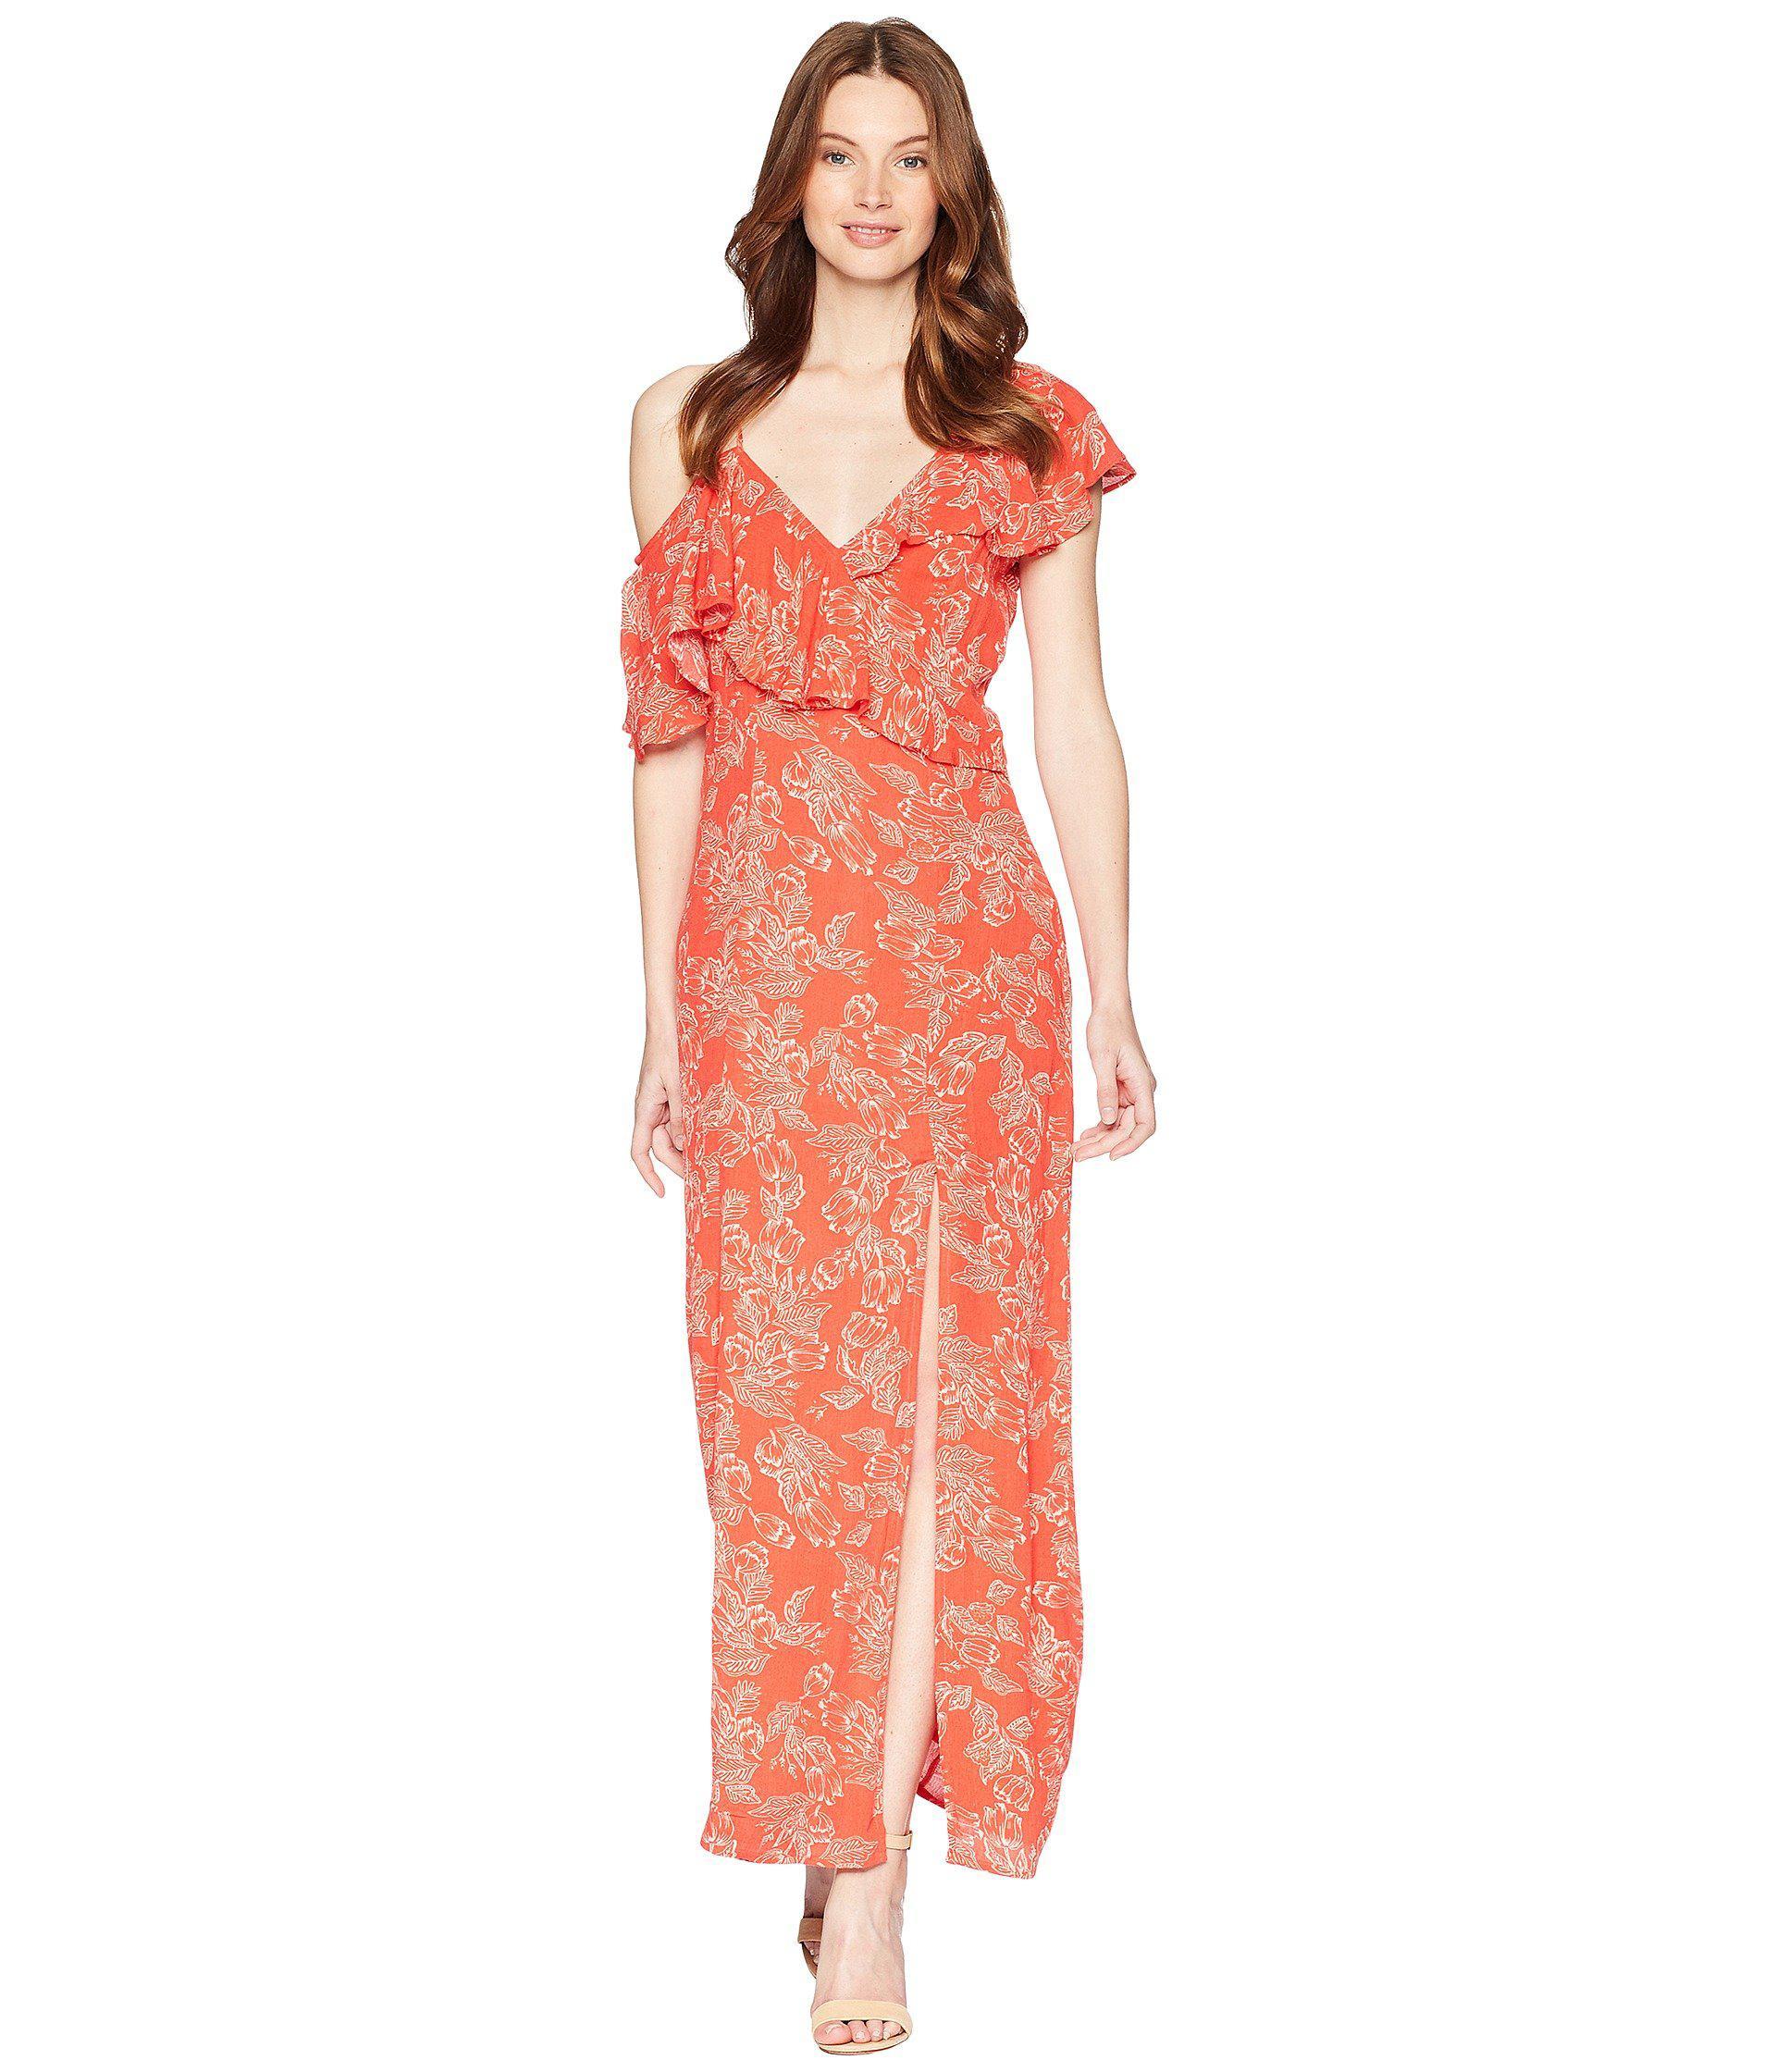 6b6f6f7549c66d Amuse Society Midnight Flower Dress in Red - Save 51% - Lyst